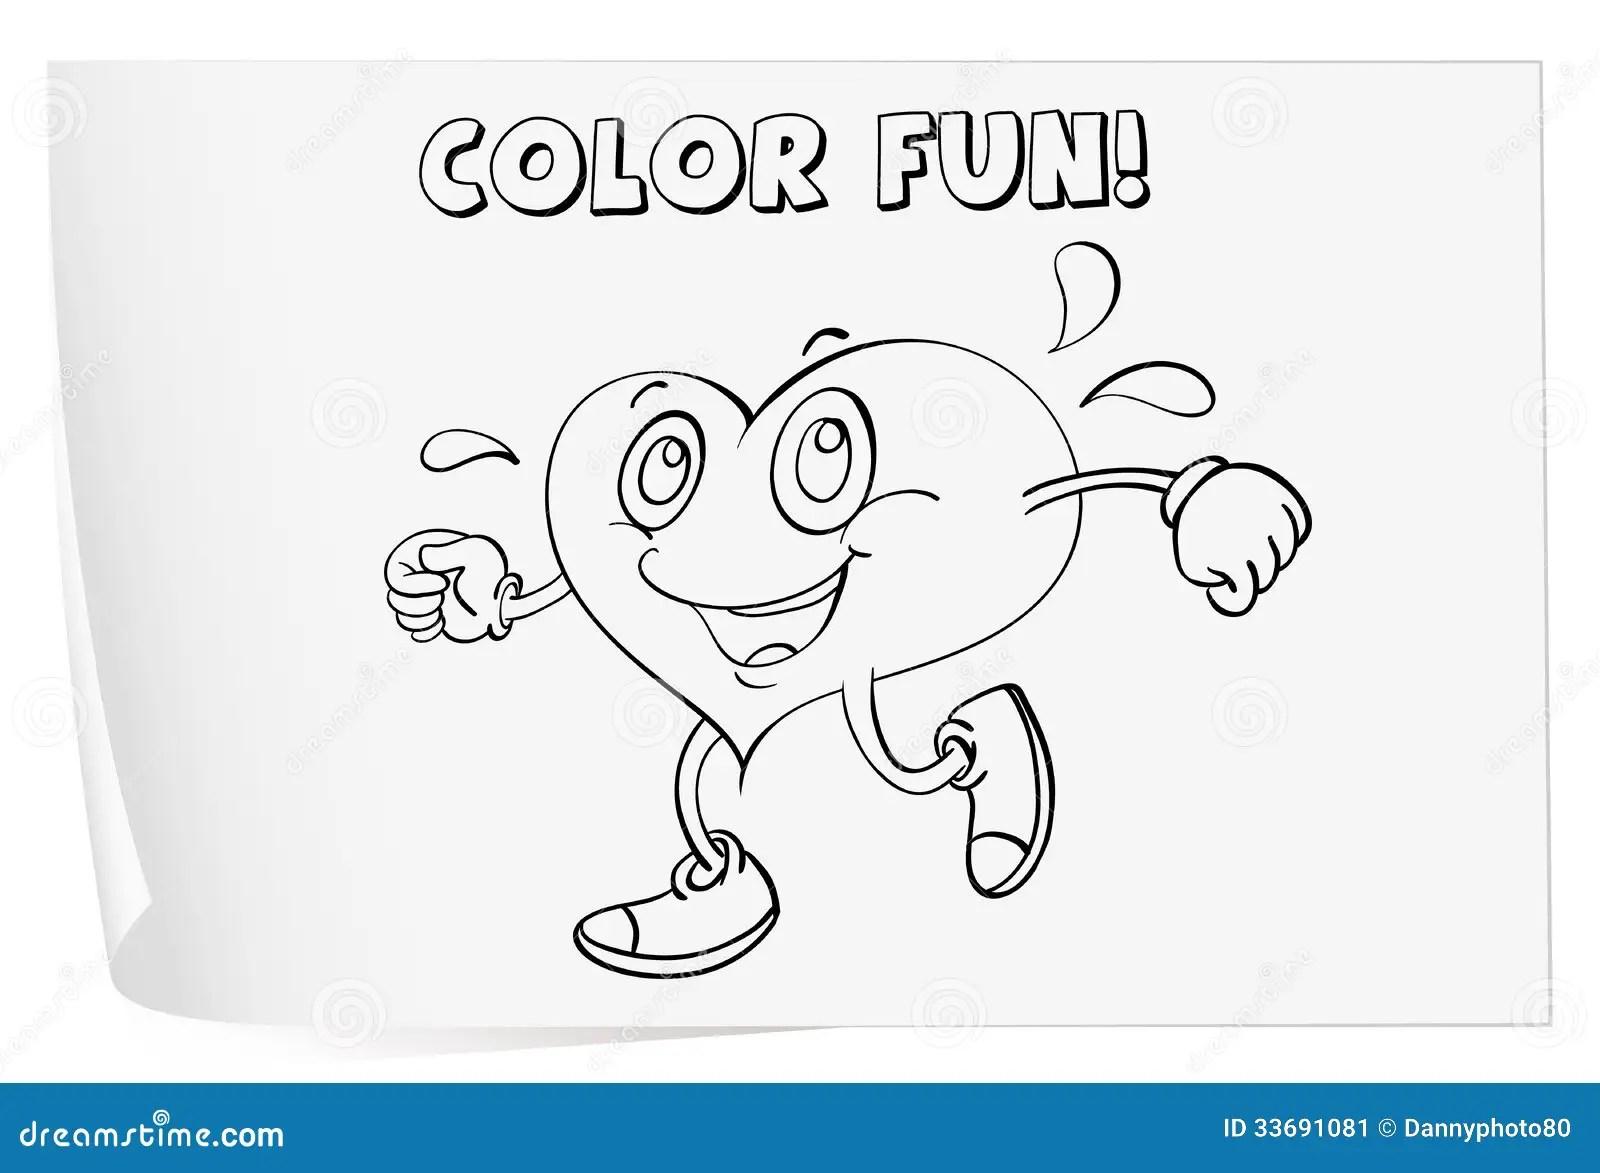 Coloring Worksheet Stock Image